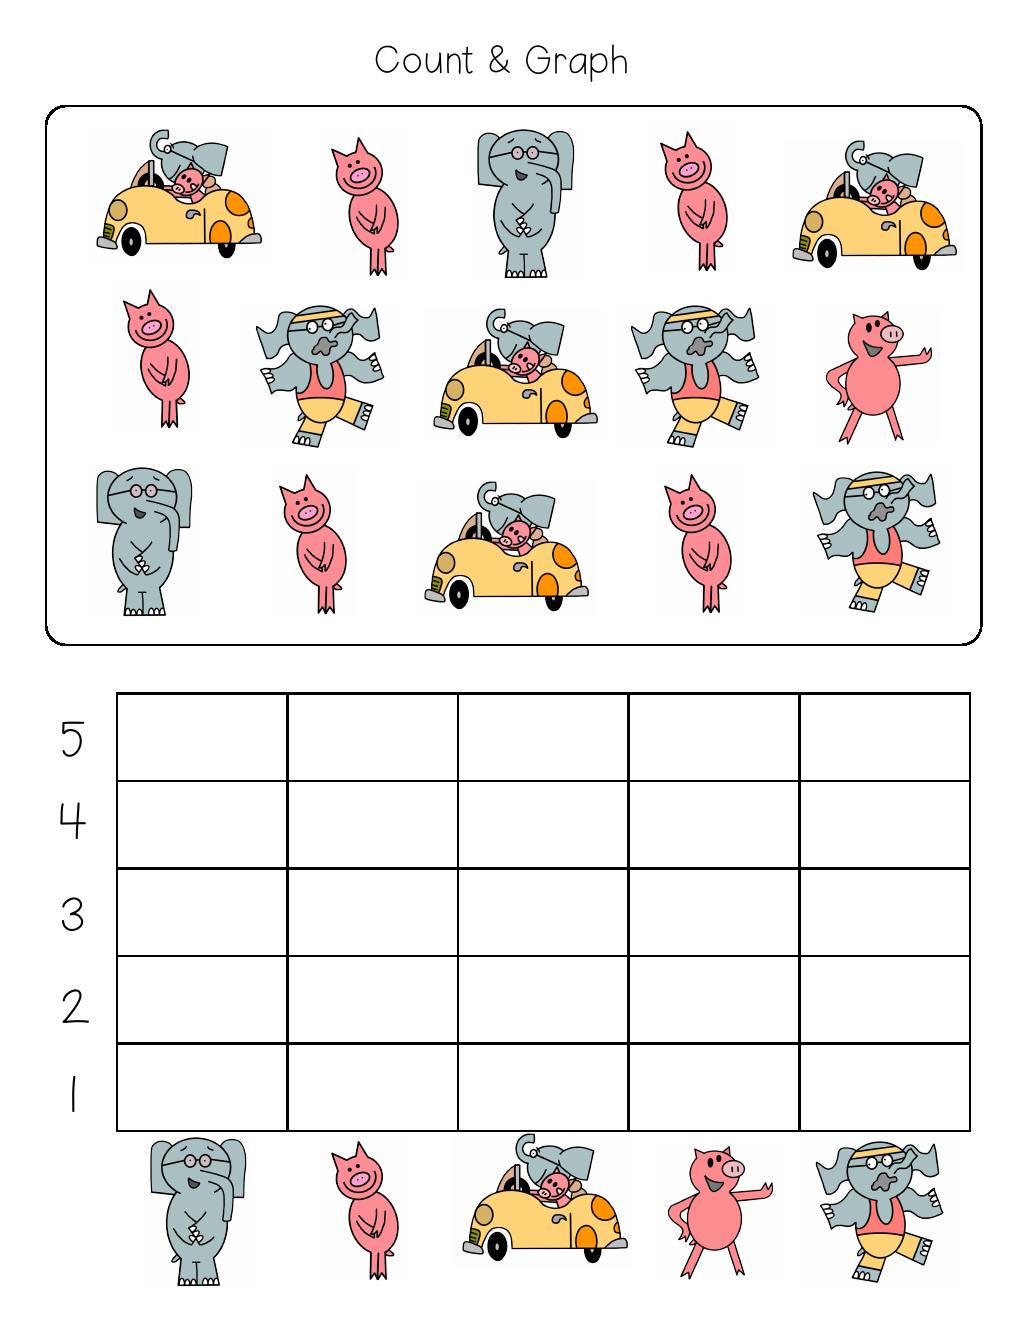 shape activity shape activity for preschool shape activity for toddlers shape activity for kindergarten